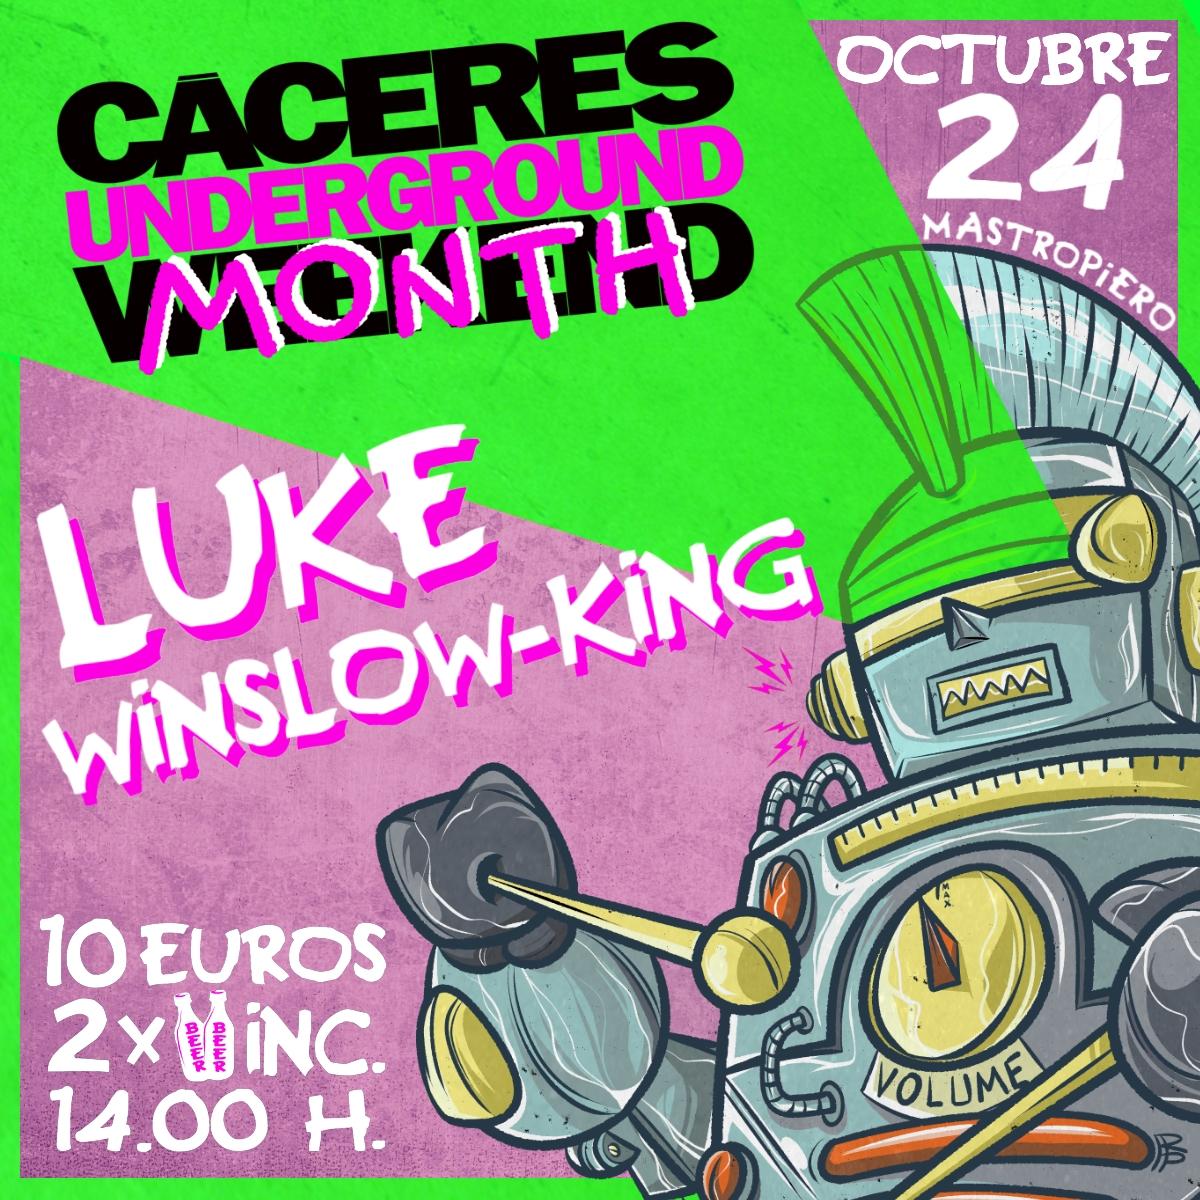 luke winslow king en caceres 16313012265611818